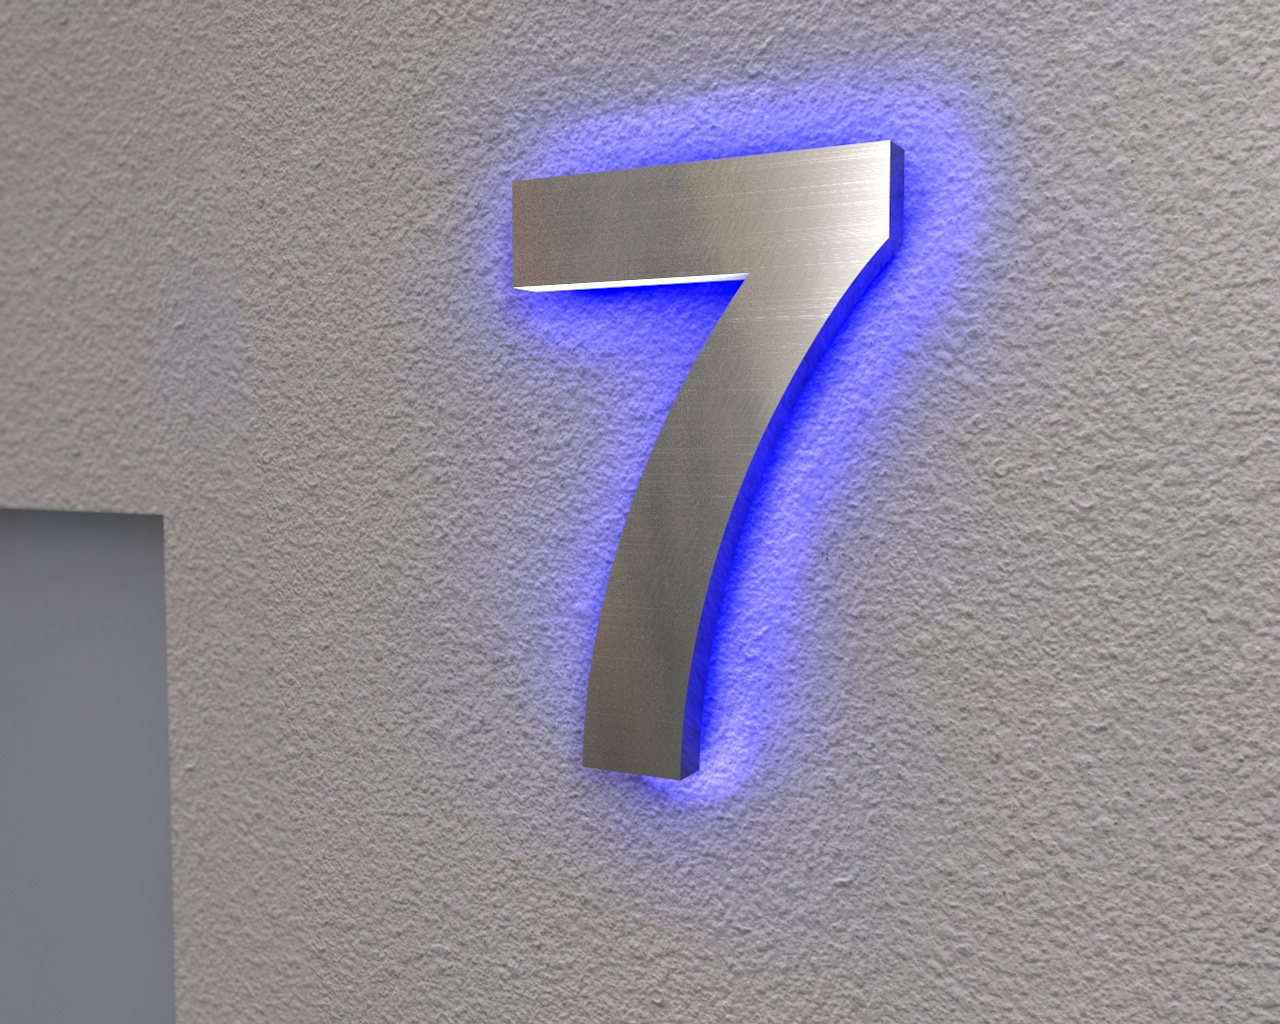 edelstahl hausnummer beleuchtete hausnummer 7 ambilight. Black Bedroom Furniture Sets. Home Design Ideas